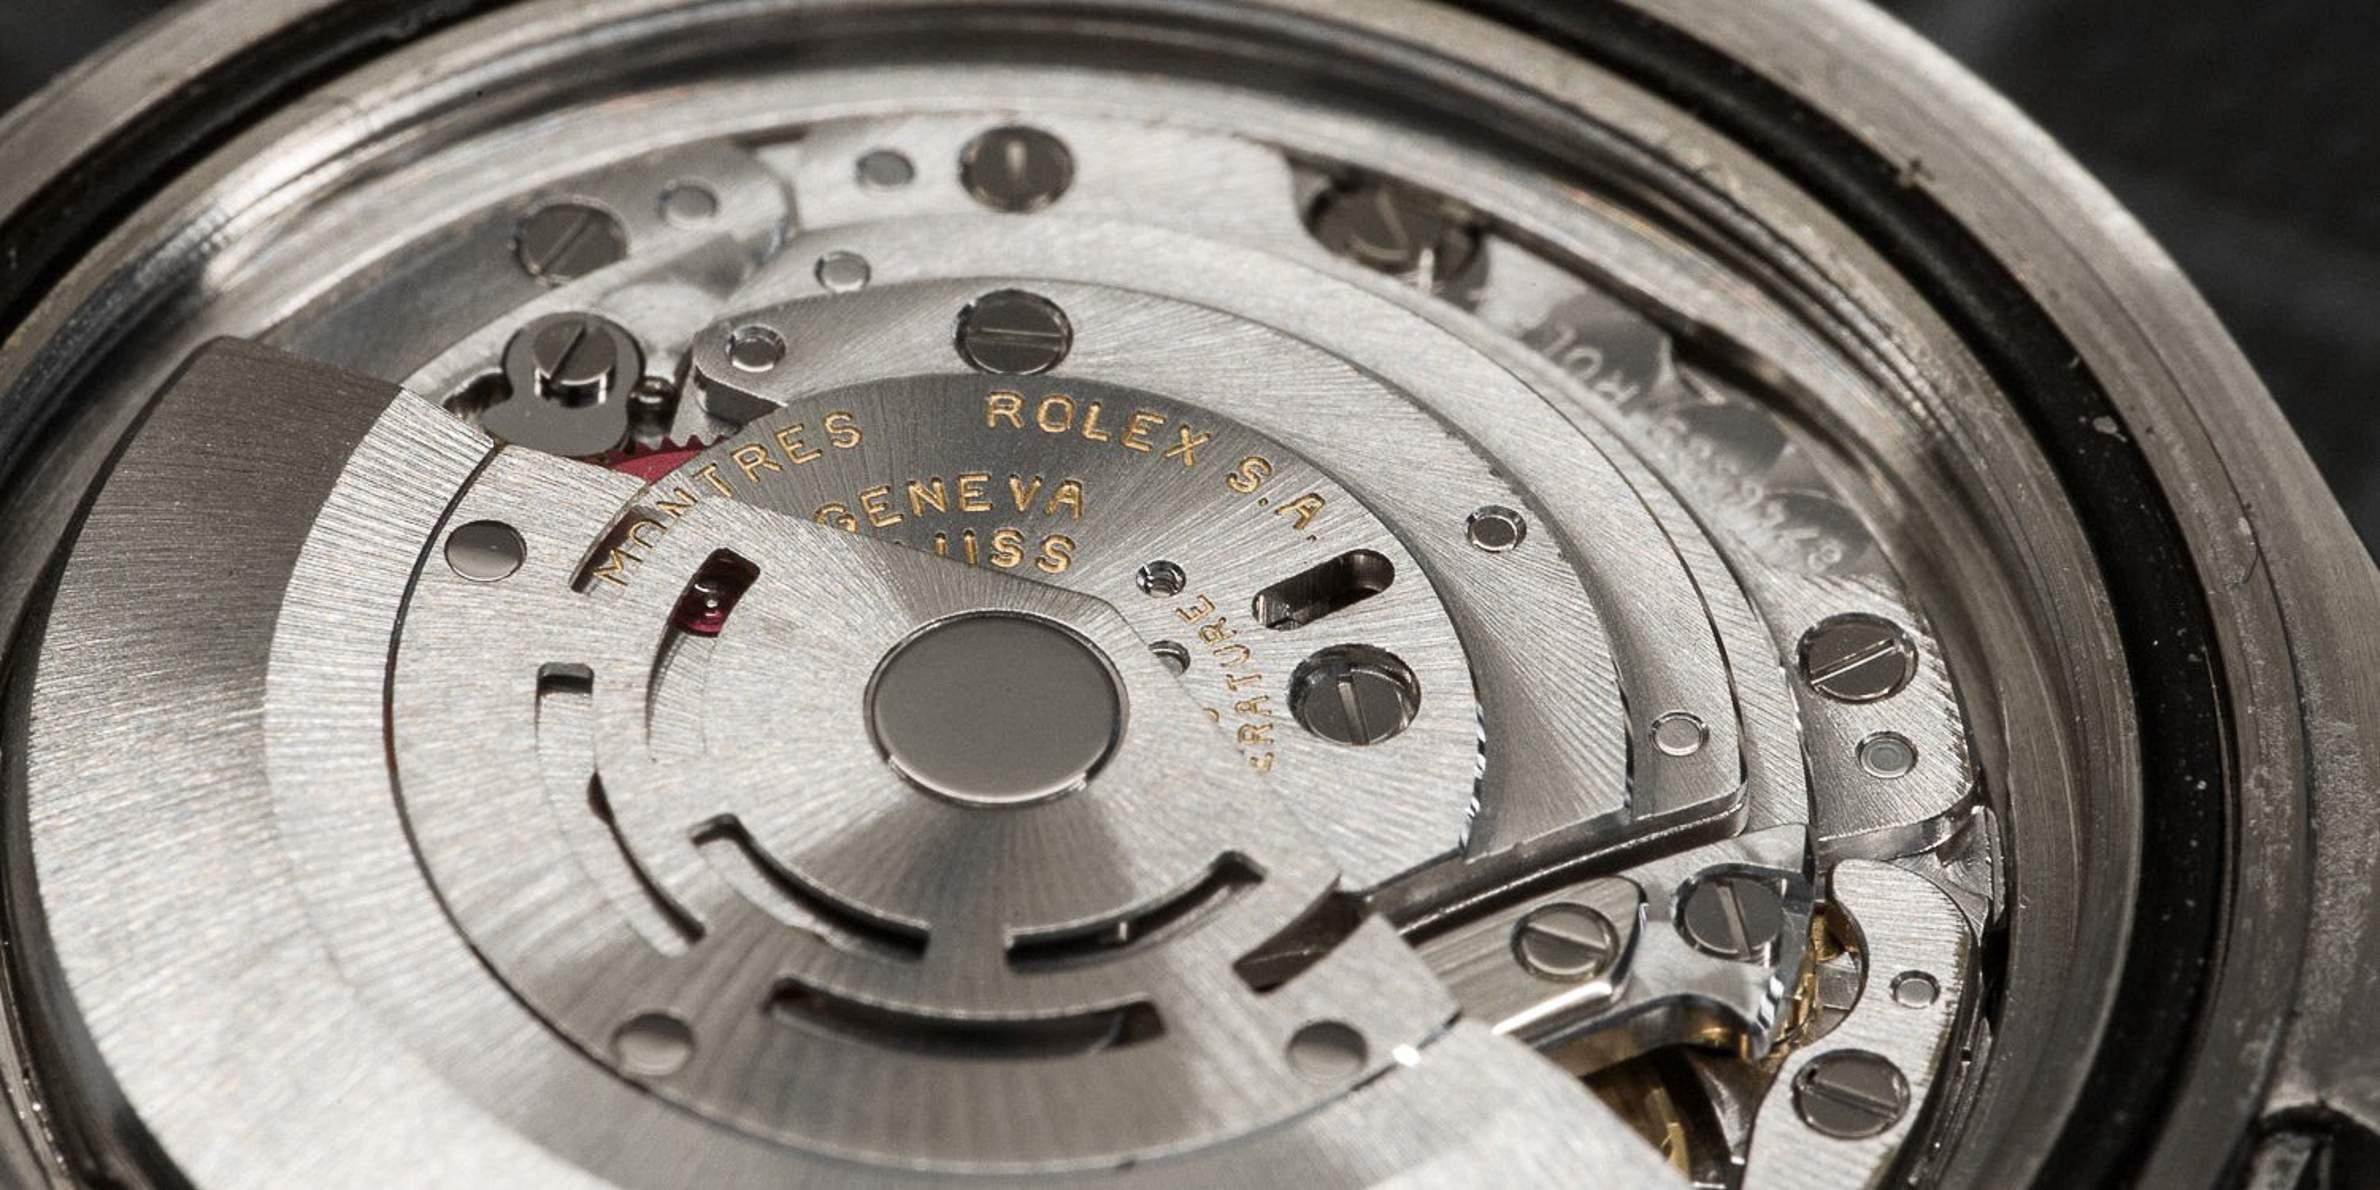 Rolex Caliber